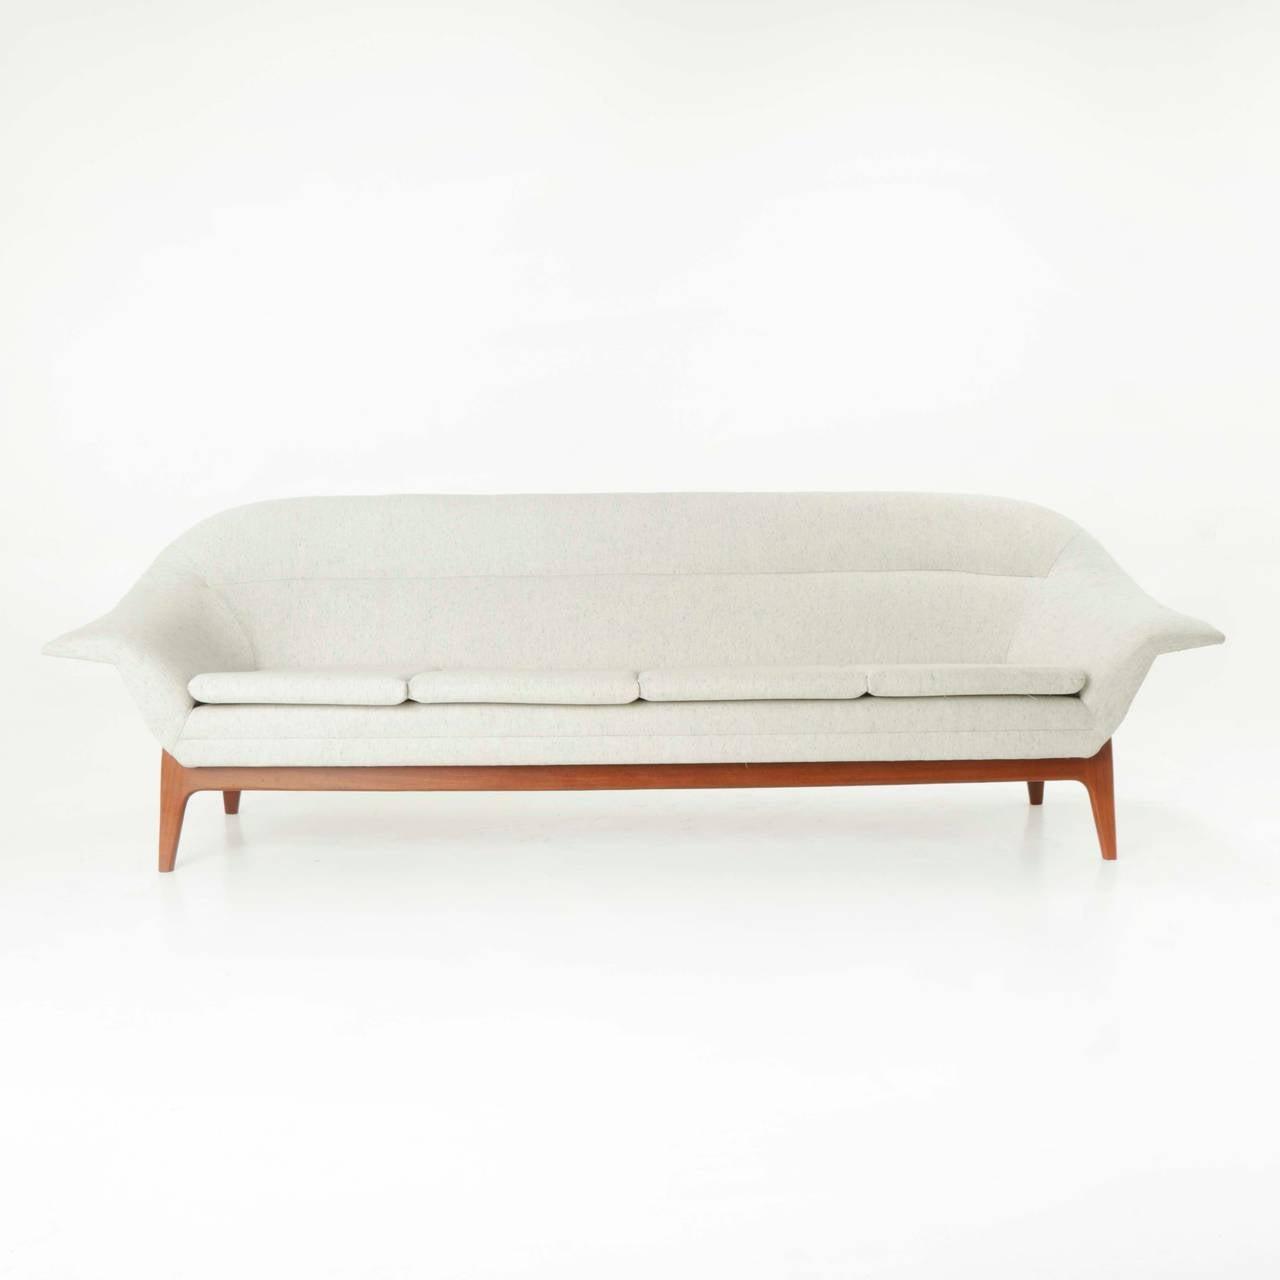 Rare Norwegian Teak and Fabric Sofa Rastad & Relling as Attribution 2